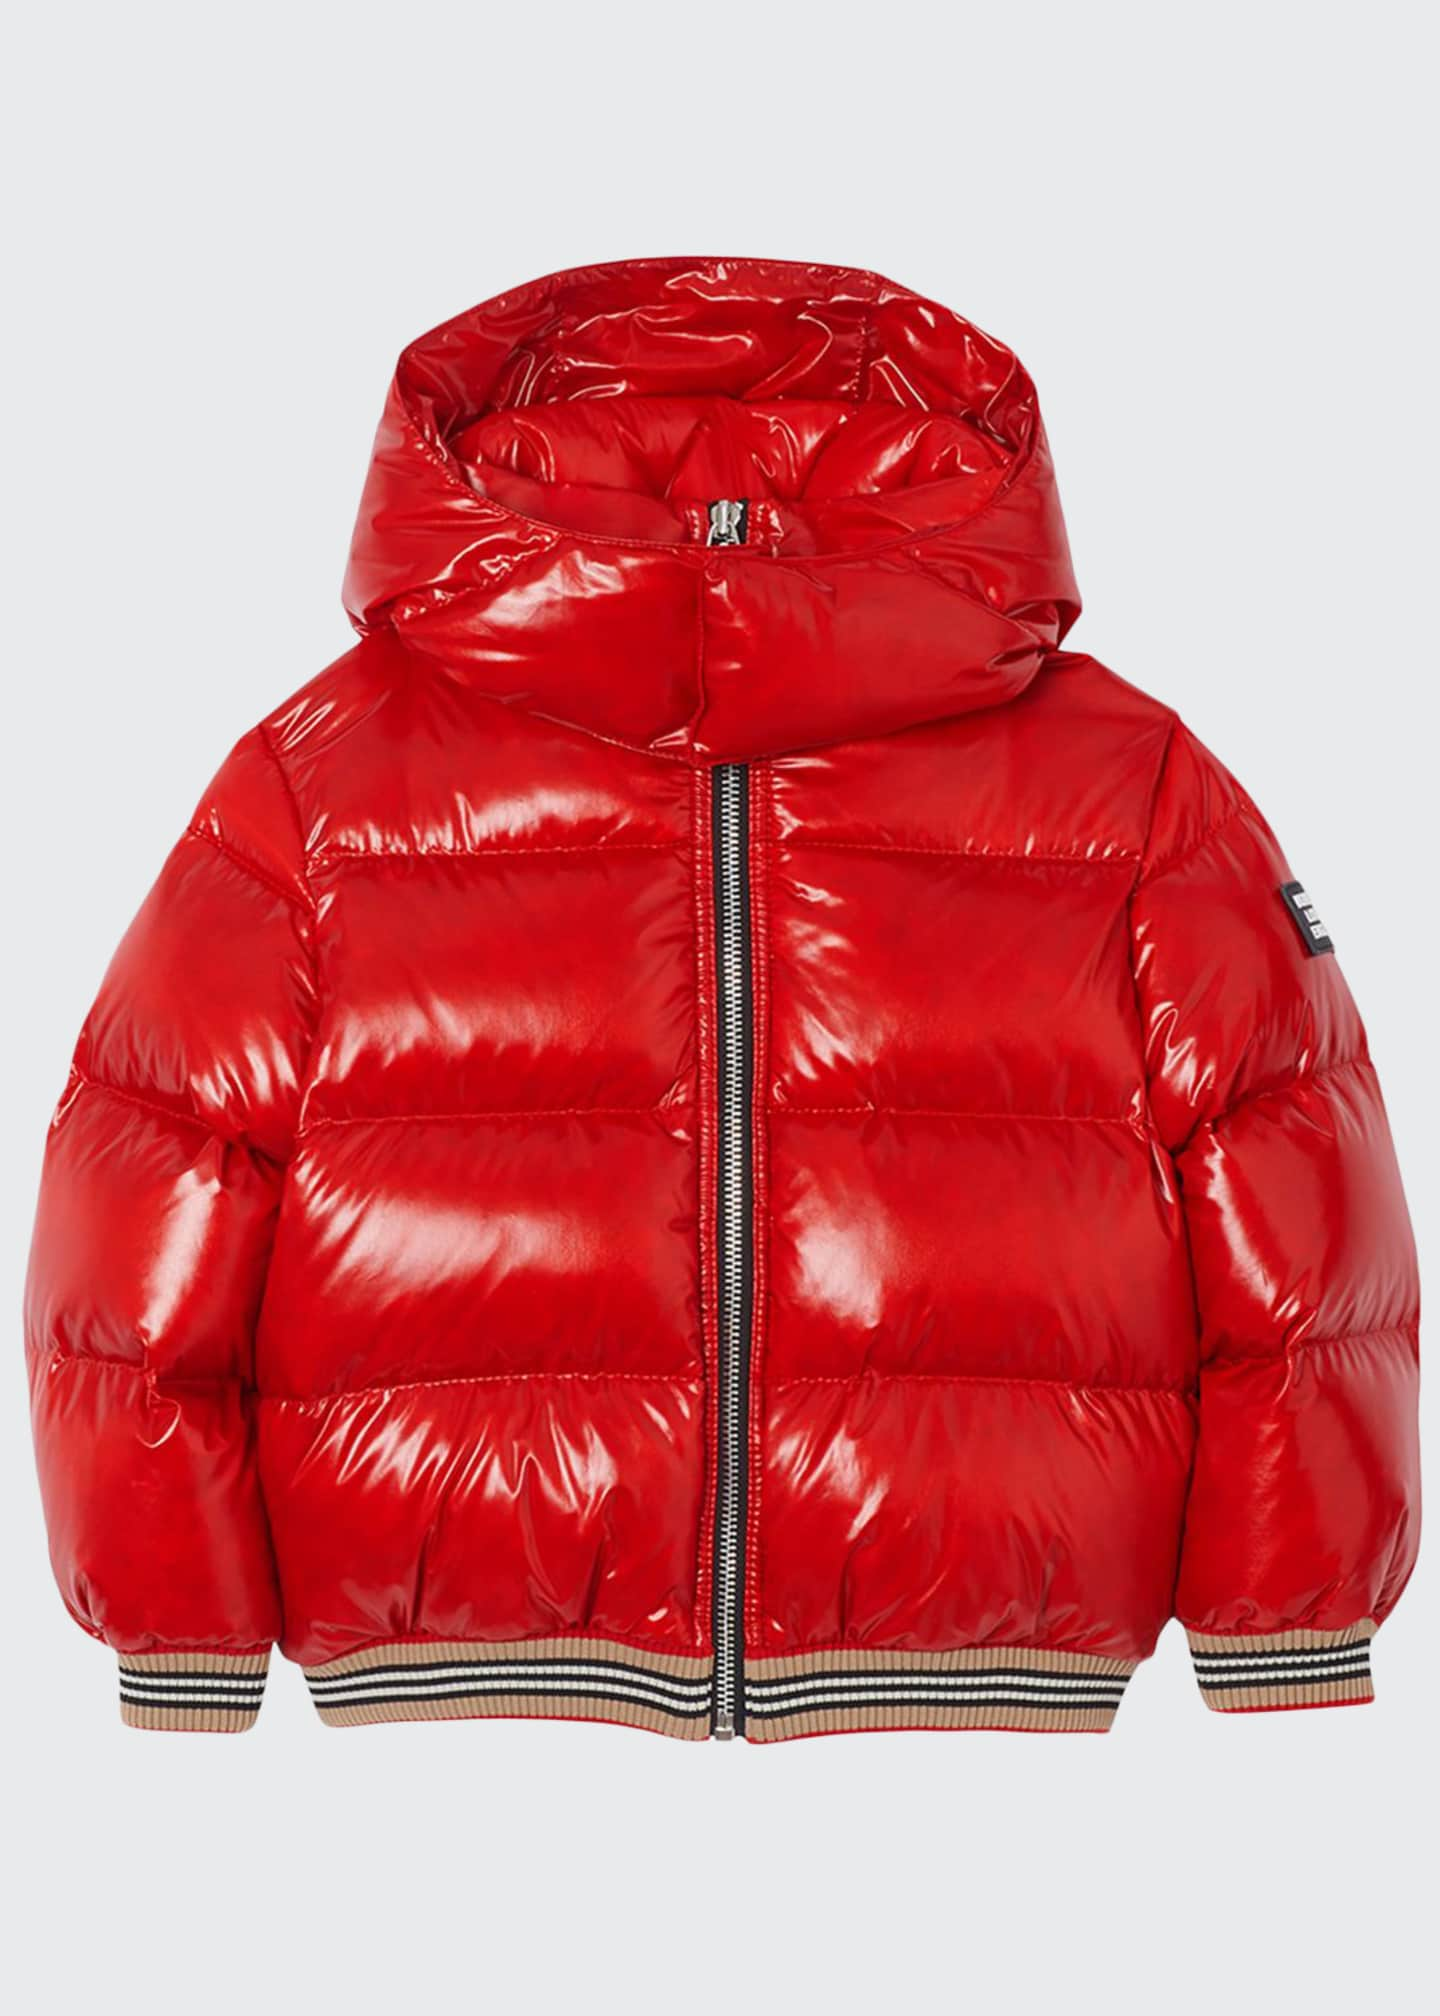 Burberry Girl's Josiah Short Puffer Coat w/ Icon